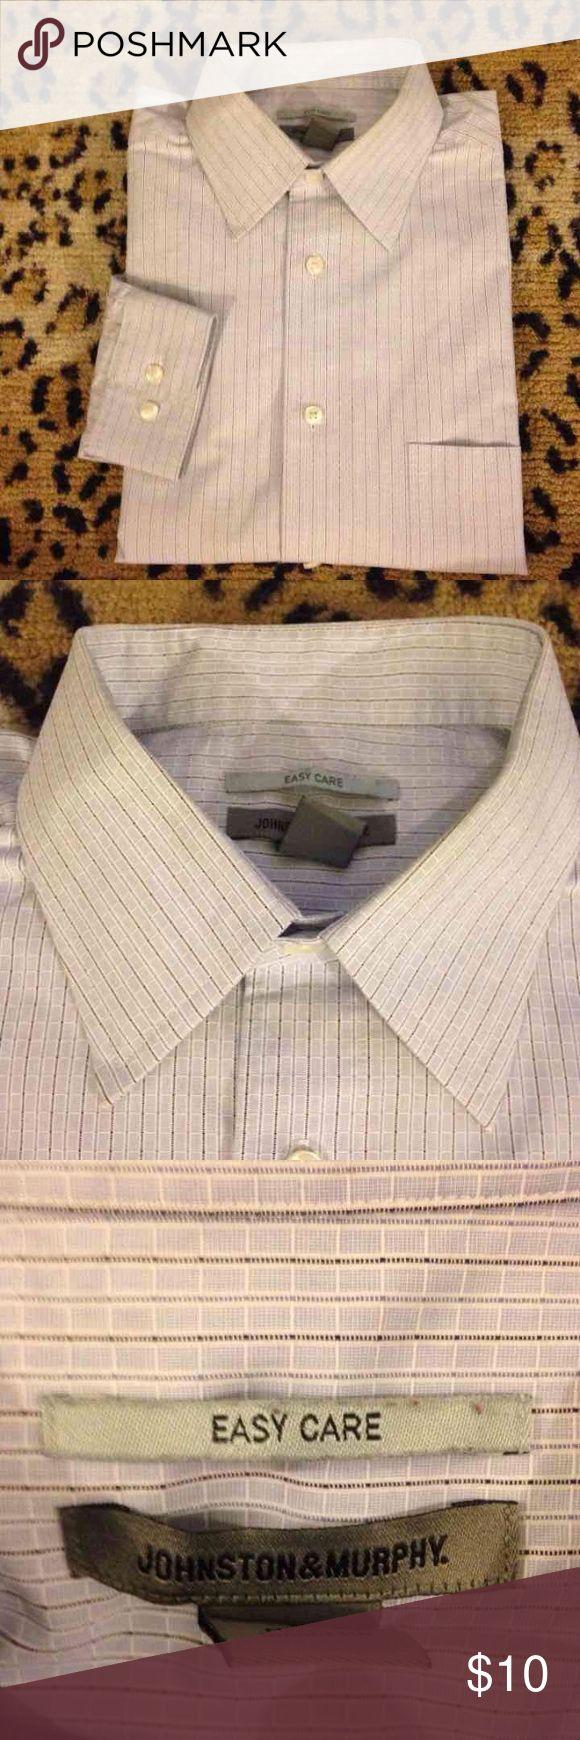 Spotted while shopping on Poshmark: Johnston & Murphy Blue Check Shirt L! #poshmark #fashion #shopping #style #Johnston & Murphy #Other